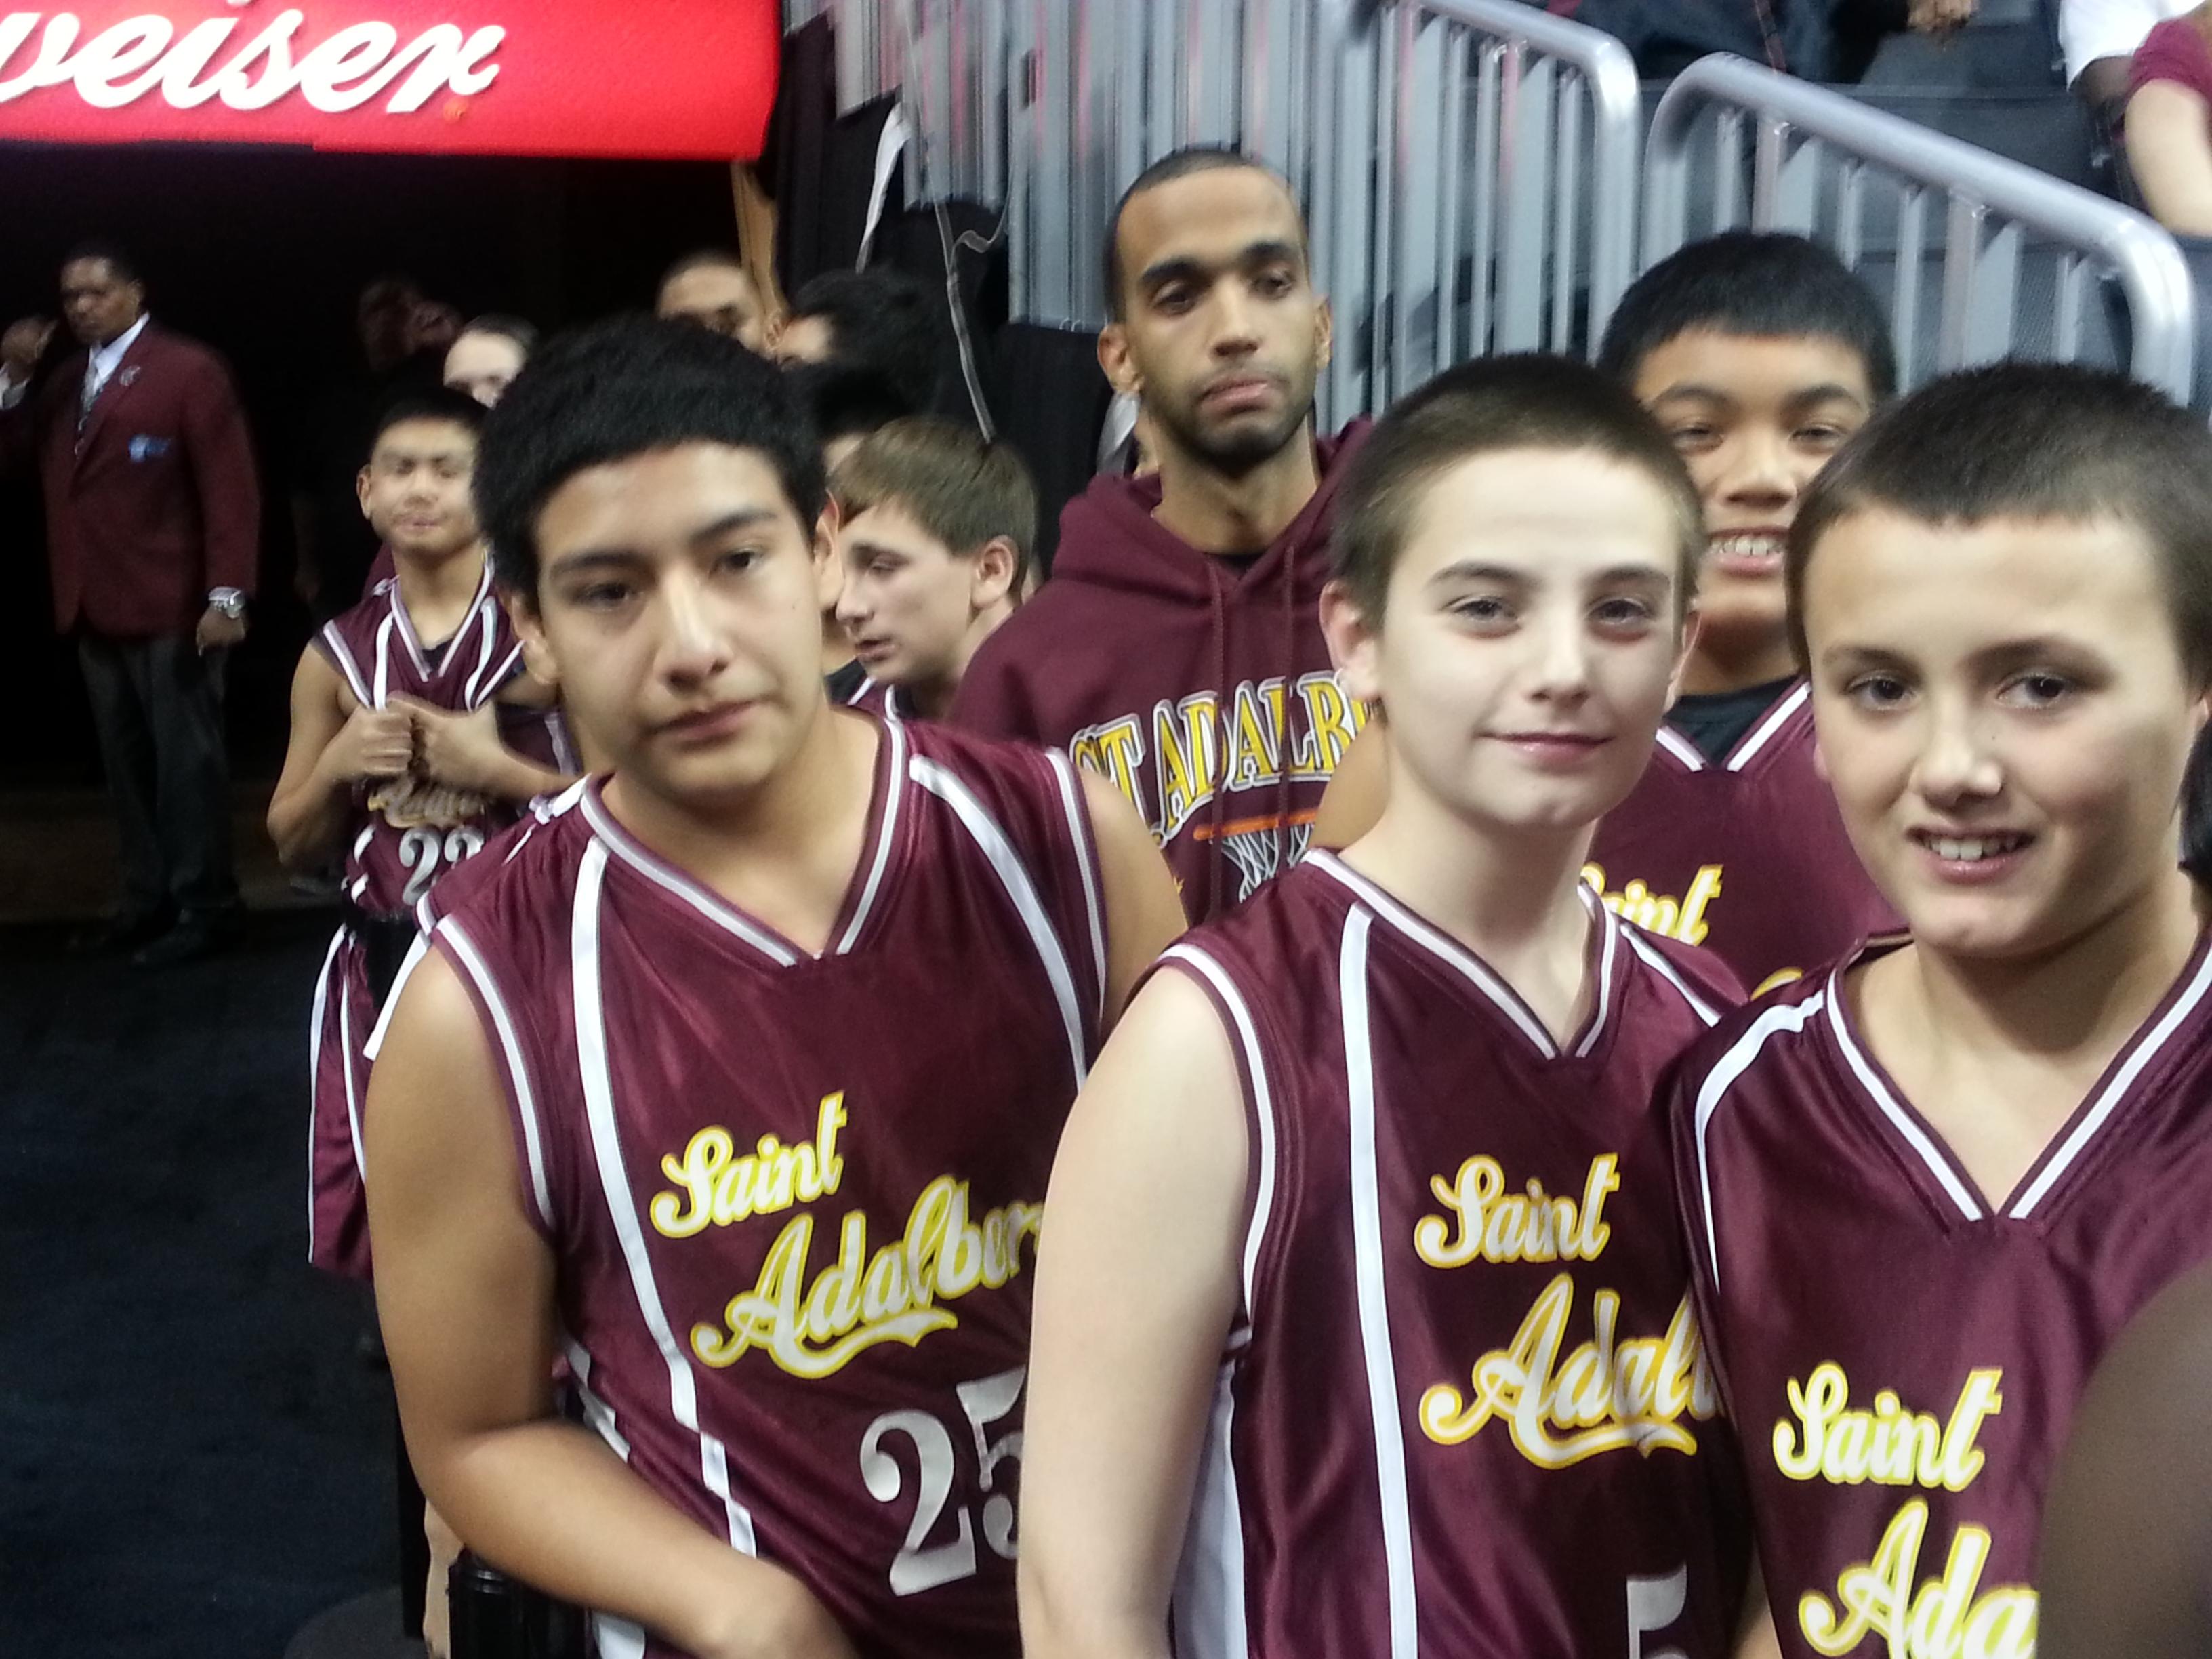 Photos: CYO Basketball Teams Play at Barclays Center - The ...